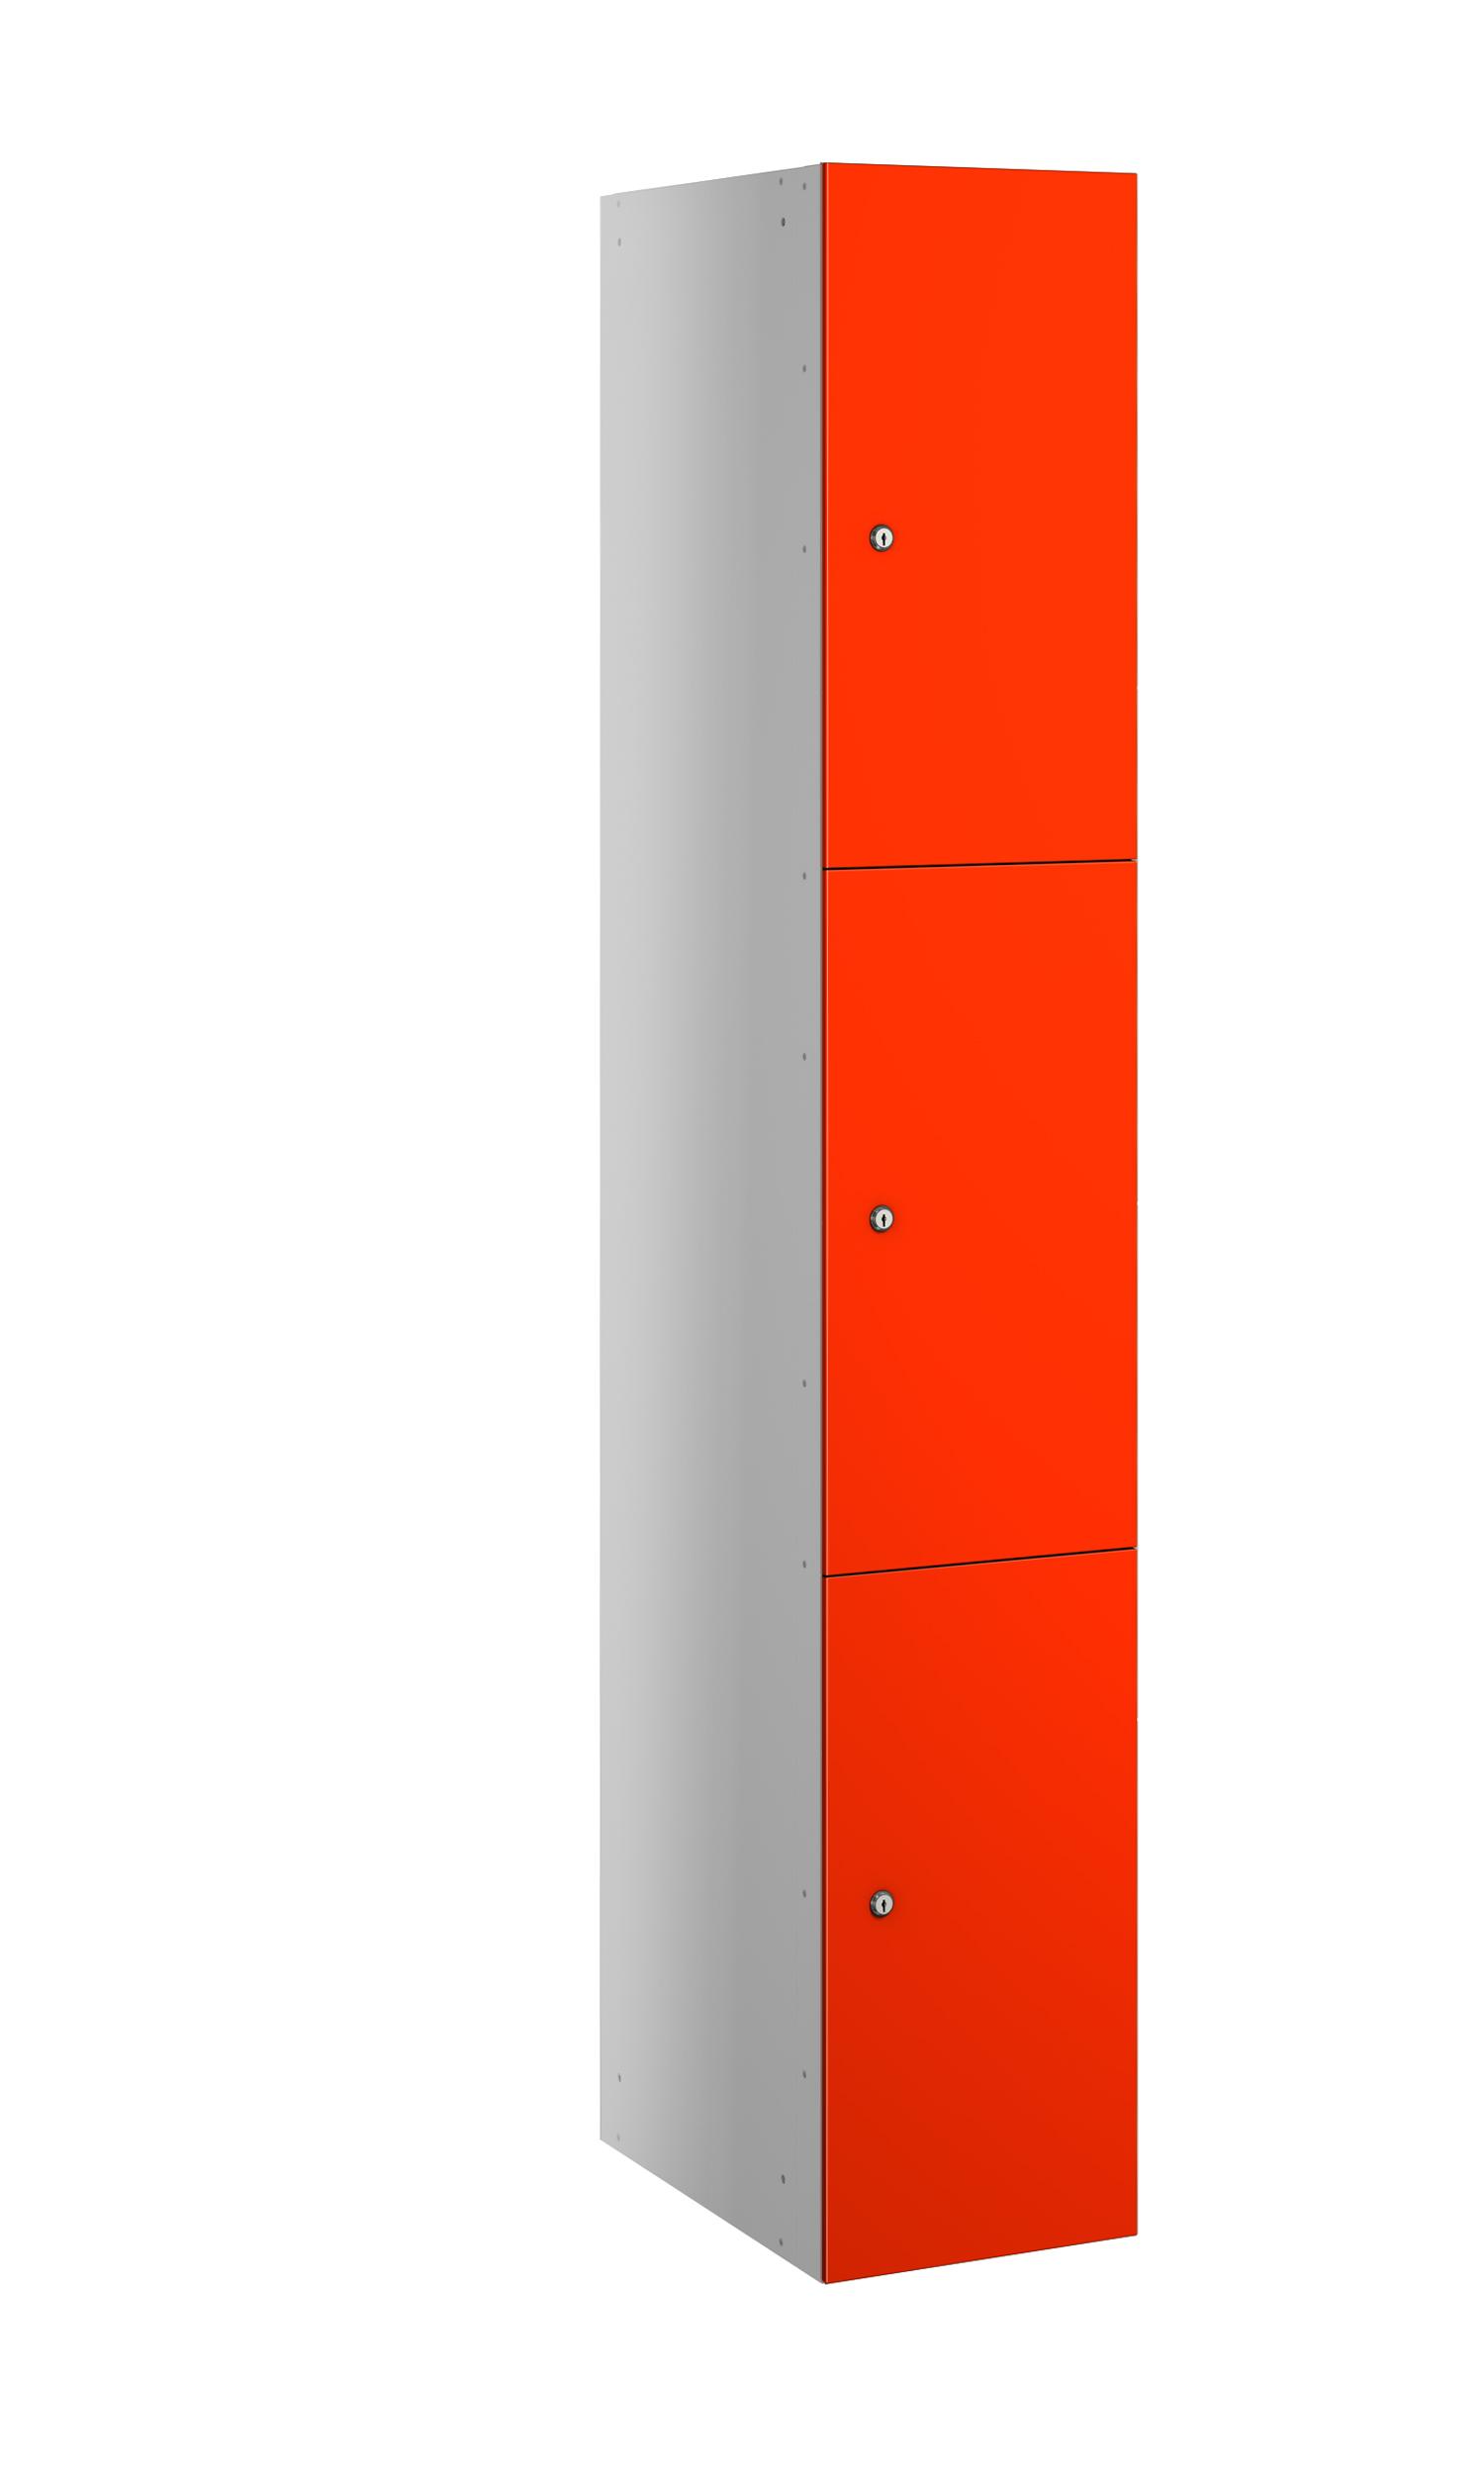 Probe buzzbox laminate 3 doors in orange colour